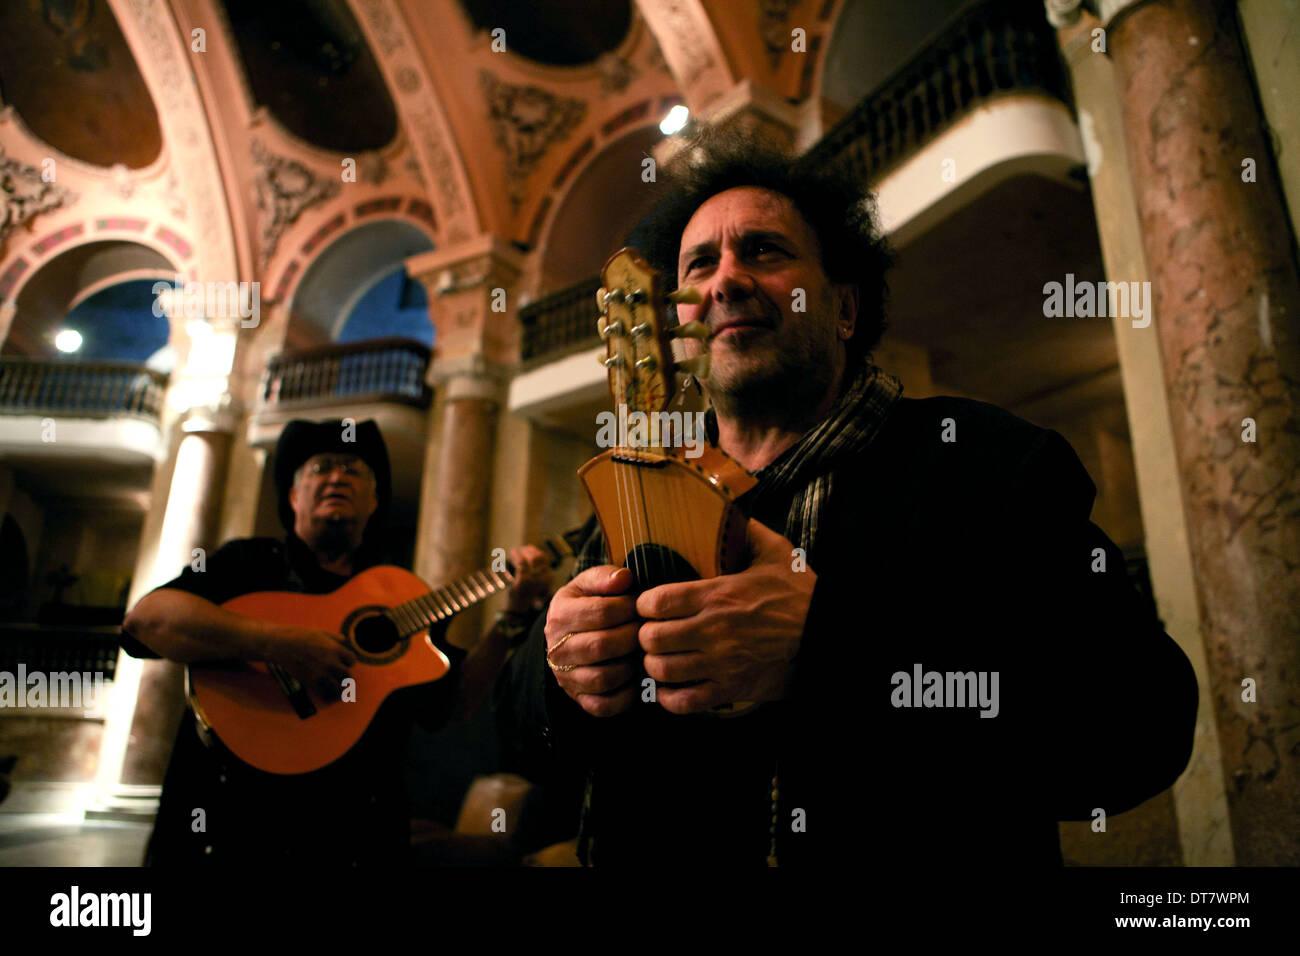 ENZO AVITABILE ENZO AVITABILE MUSIC LIFE (2012) - Stock Image